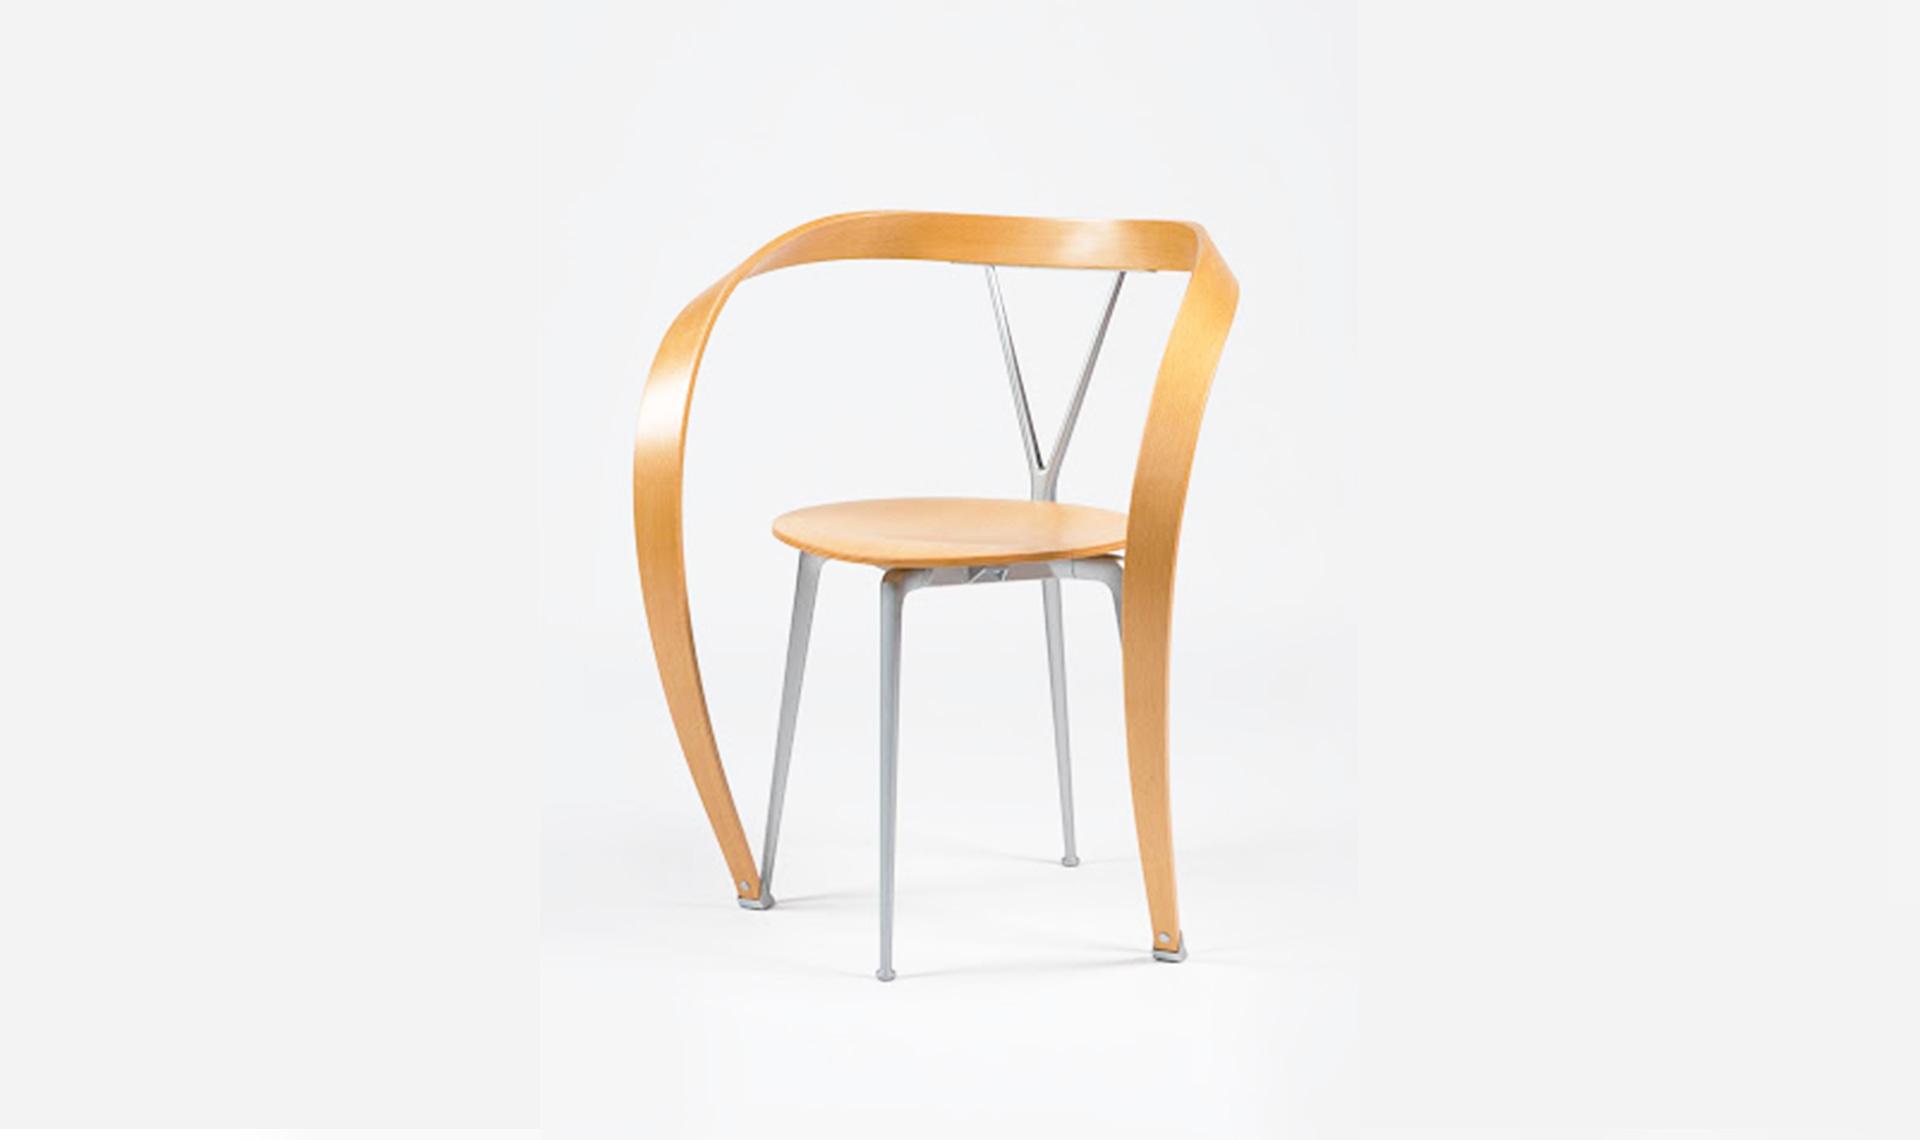 100 лет дизайна: стул Revers Андреа Бранци